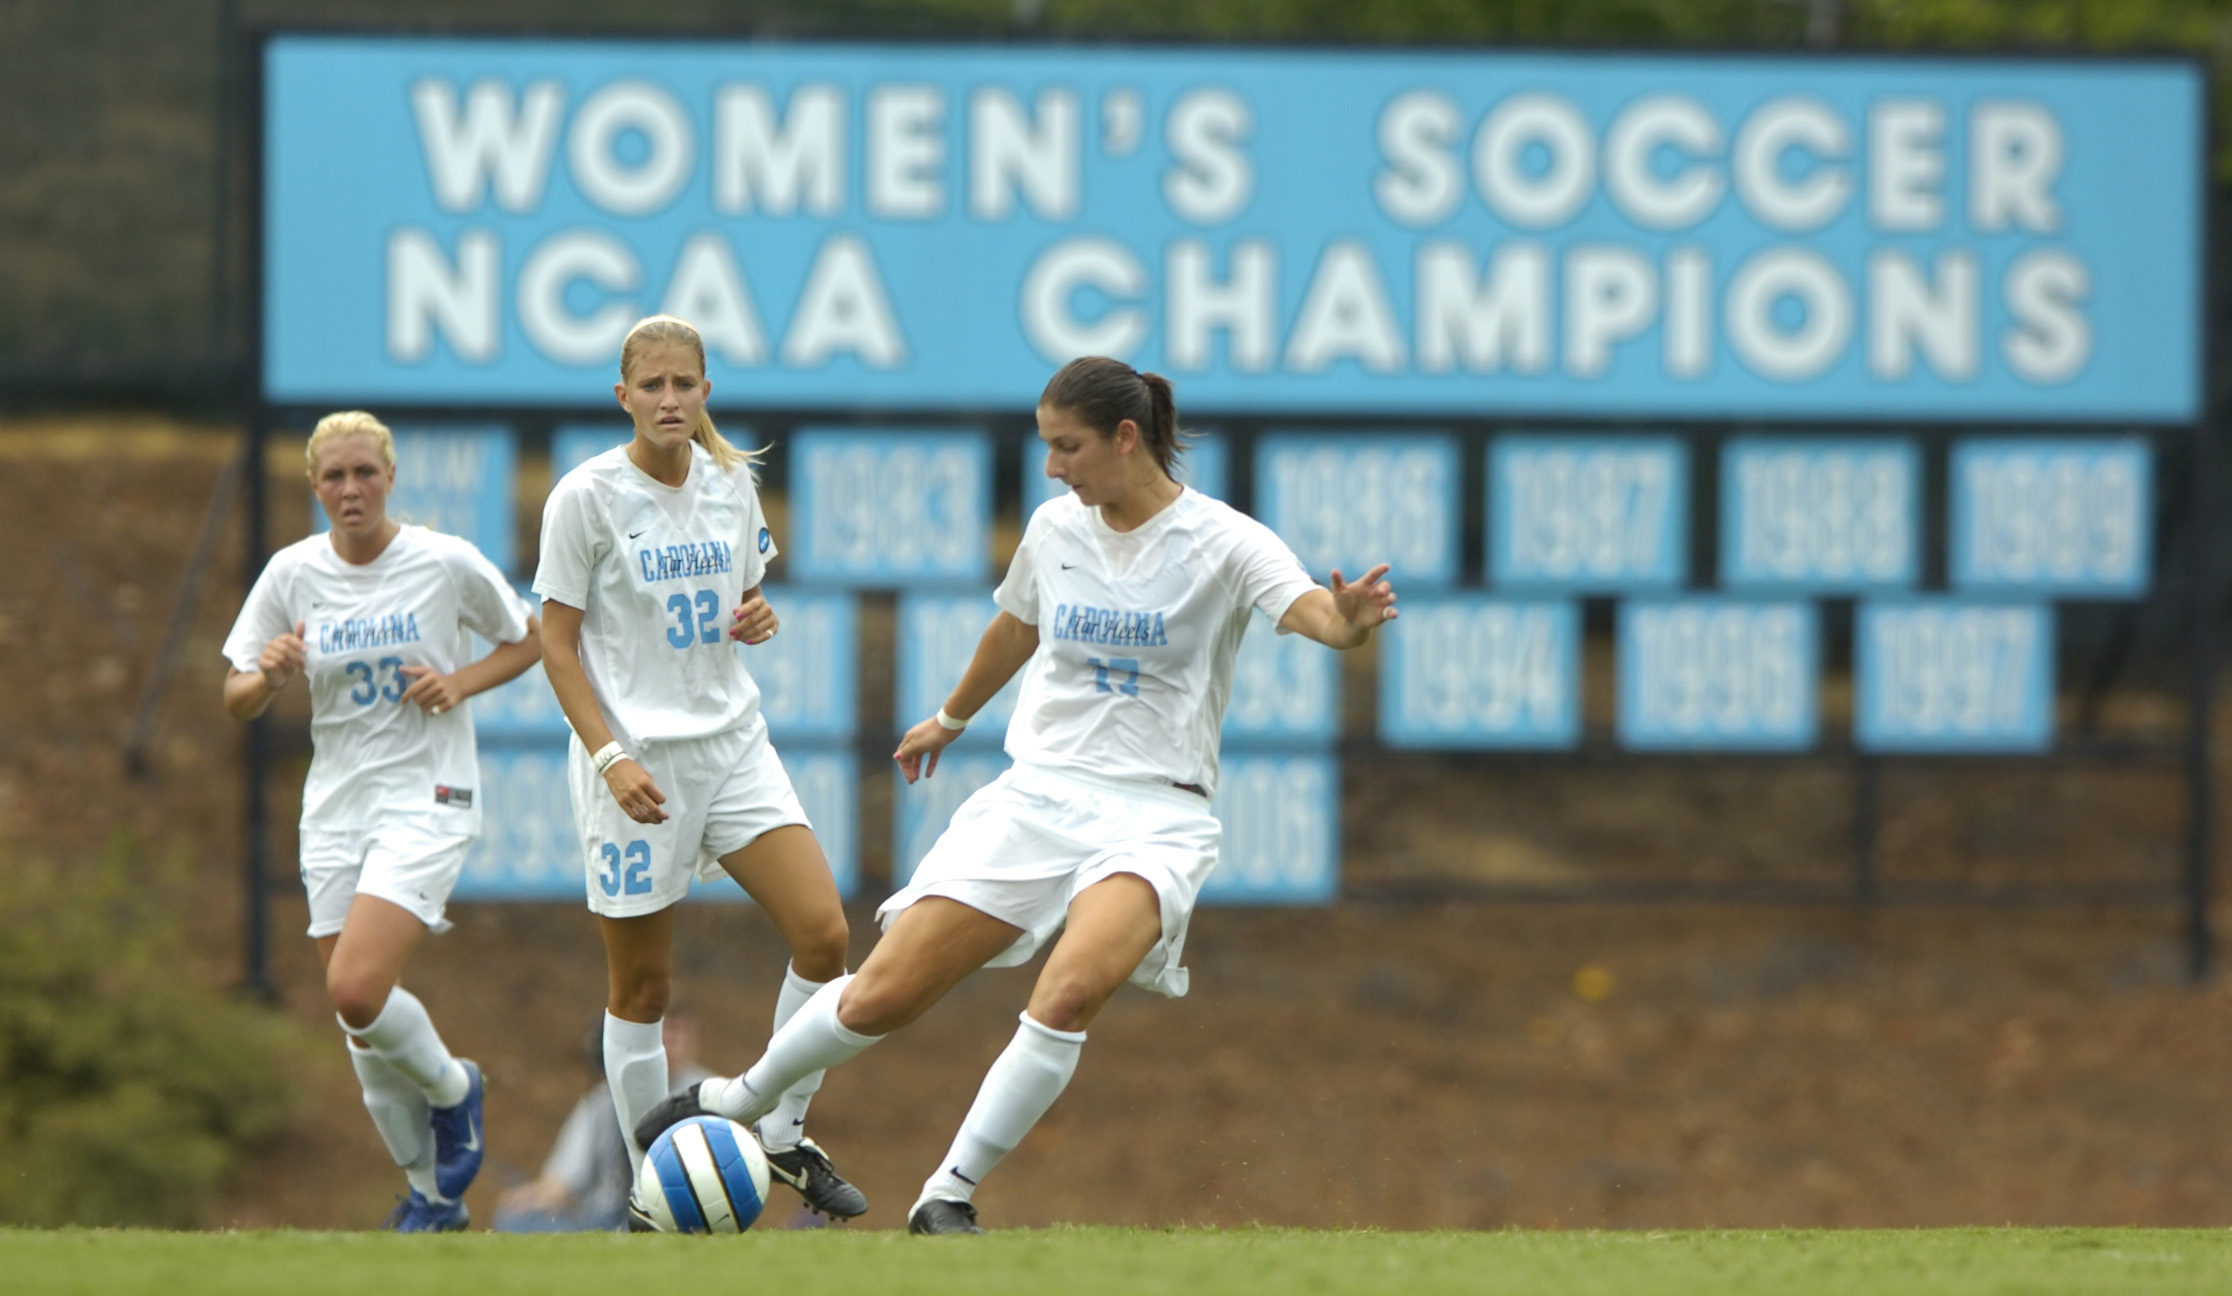 University of North Carolina Women's Soccer v South Carolina UNC lost 1-0 Fetzer Field Chapel Hill, NC Saturday, September 1, 2007 Jeffrey A. Camarati